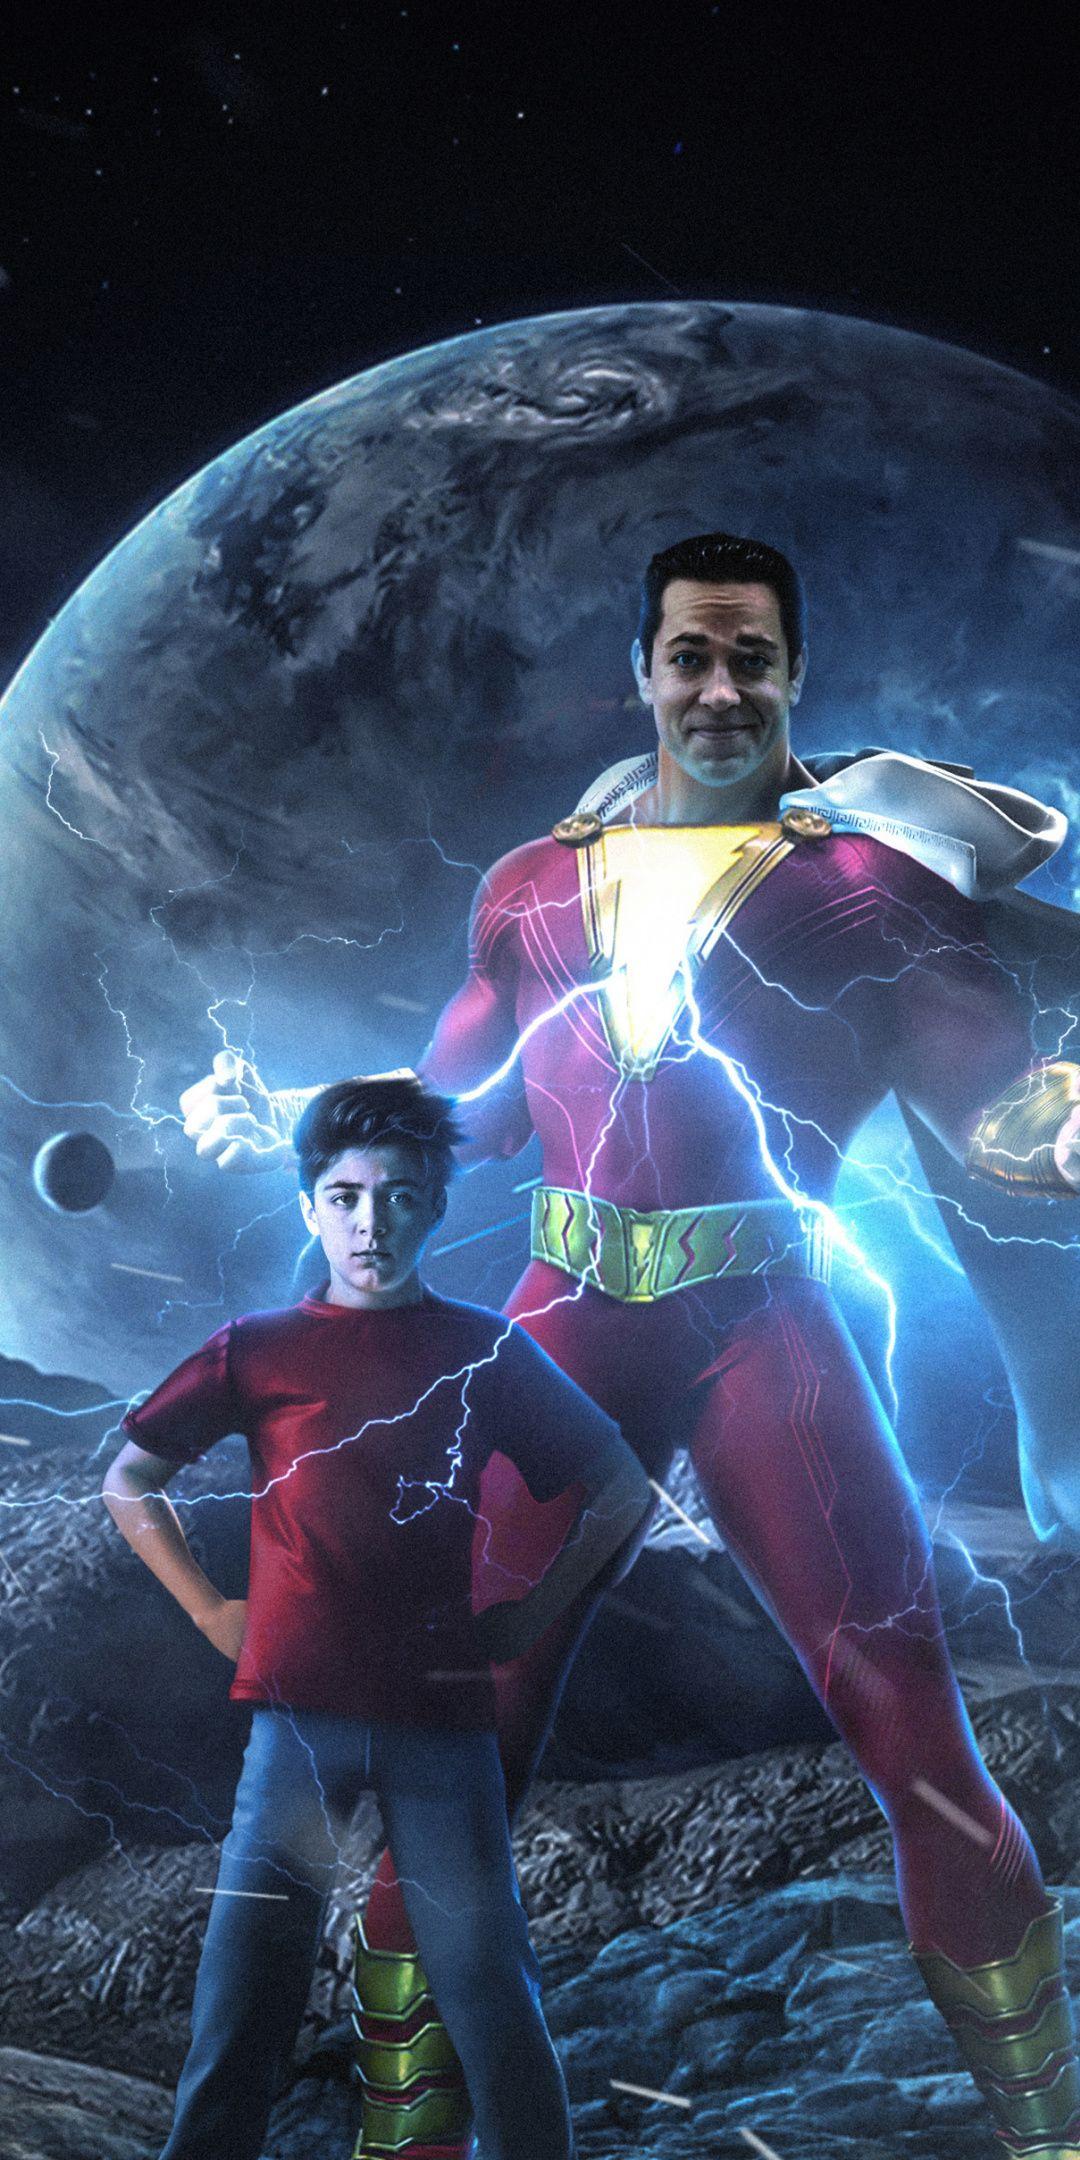 c1924b85 Shazam!, superhero, dc studio, 2018, 1080x2160 wallpaper   Movie ...